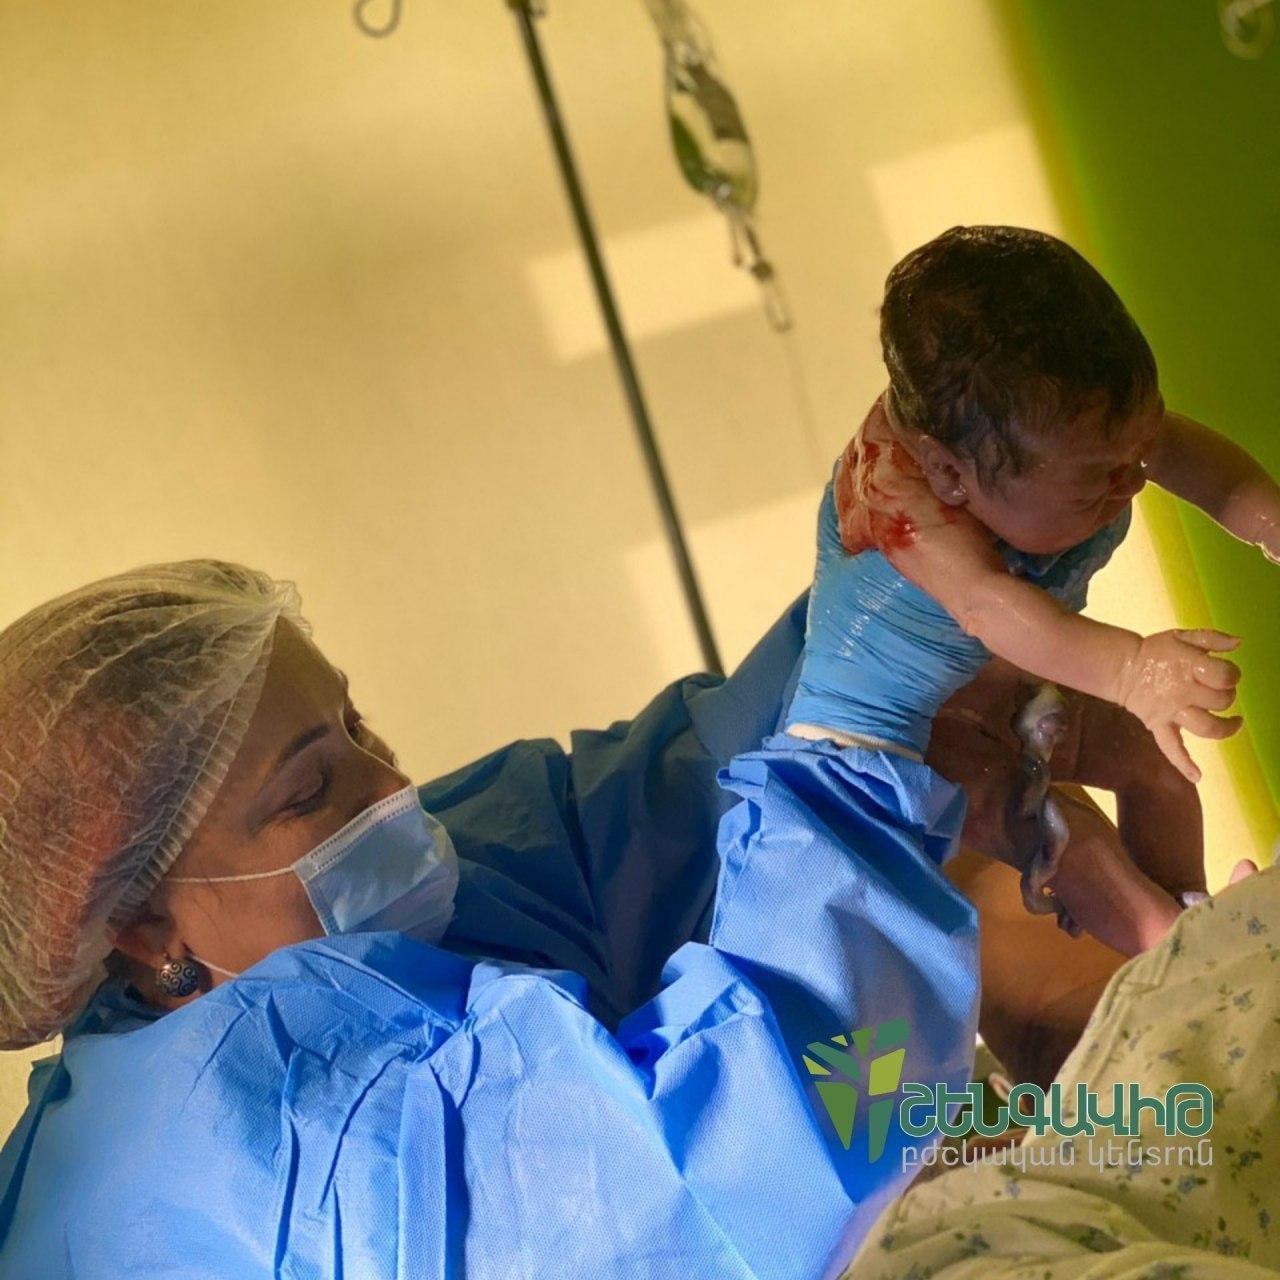 Photo of Մինչ Ադրբեջանը ռմբակոծում էր Ստեփանակերտի ծննդատունը, Երևանի Շենգավիթ բժշկական կենտրոնում ծնվեց ևս մեկ արցախցի երեխա